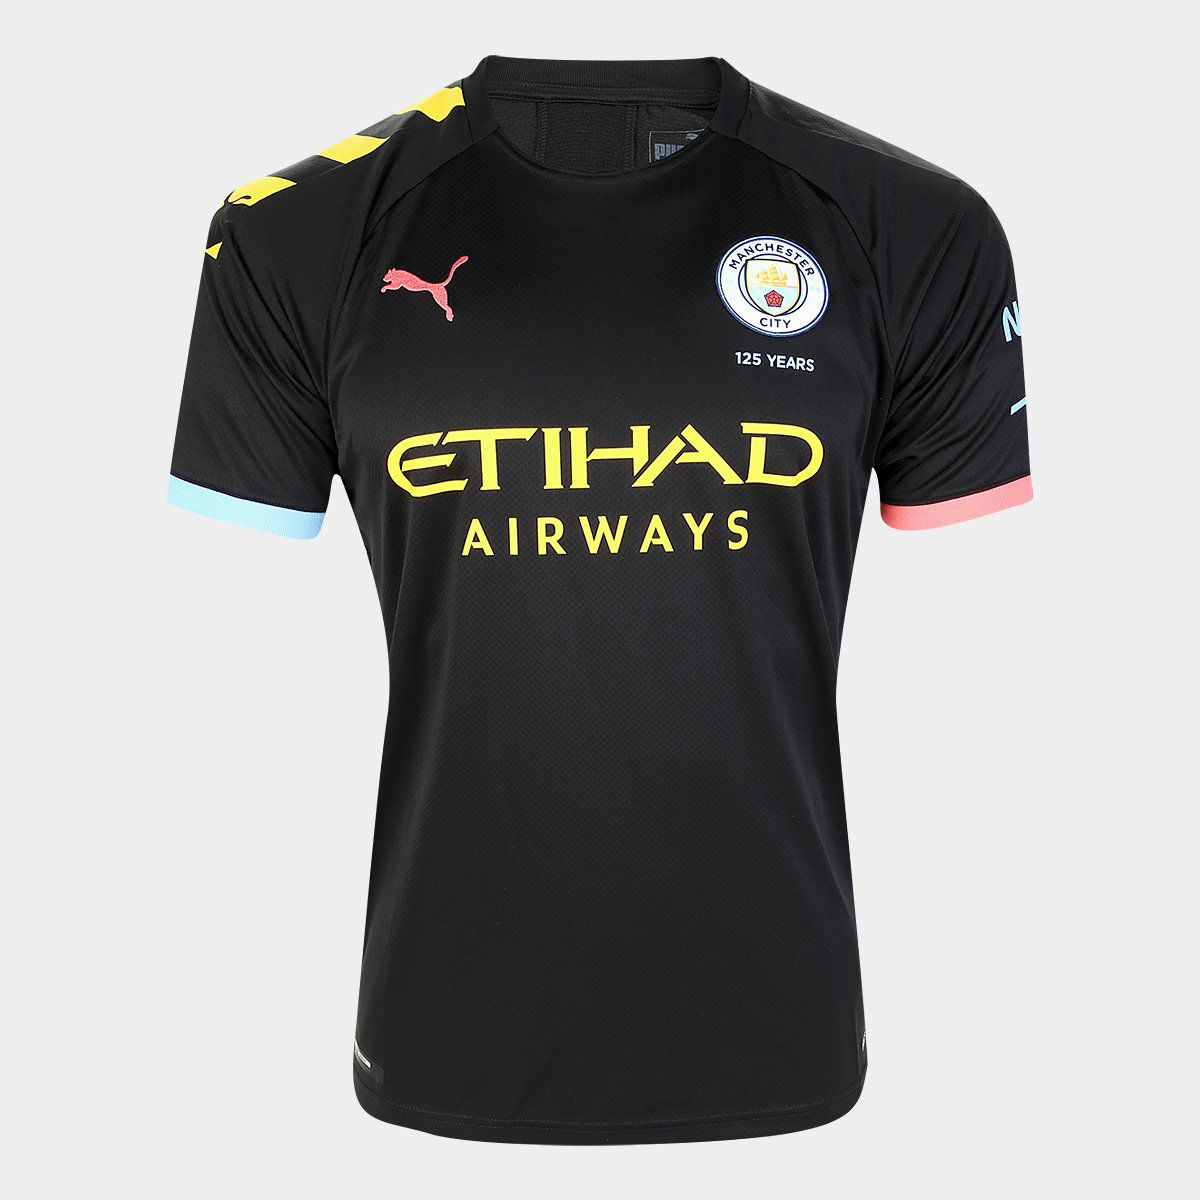 Camisa Manchester City Away 19/20 s/n° - Torcedor Puma